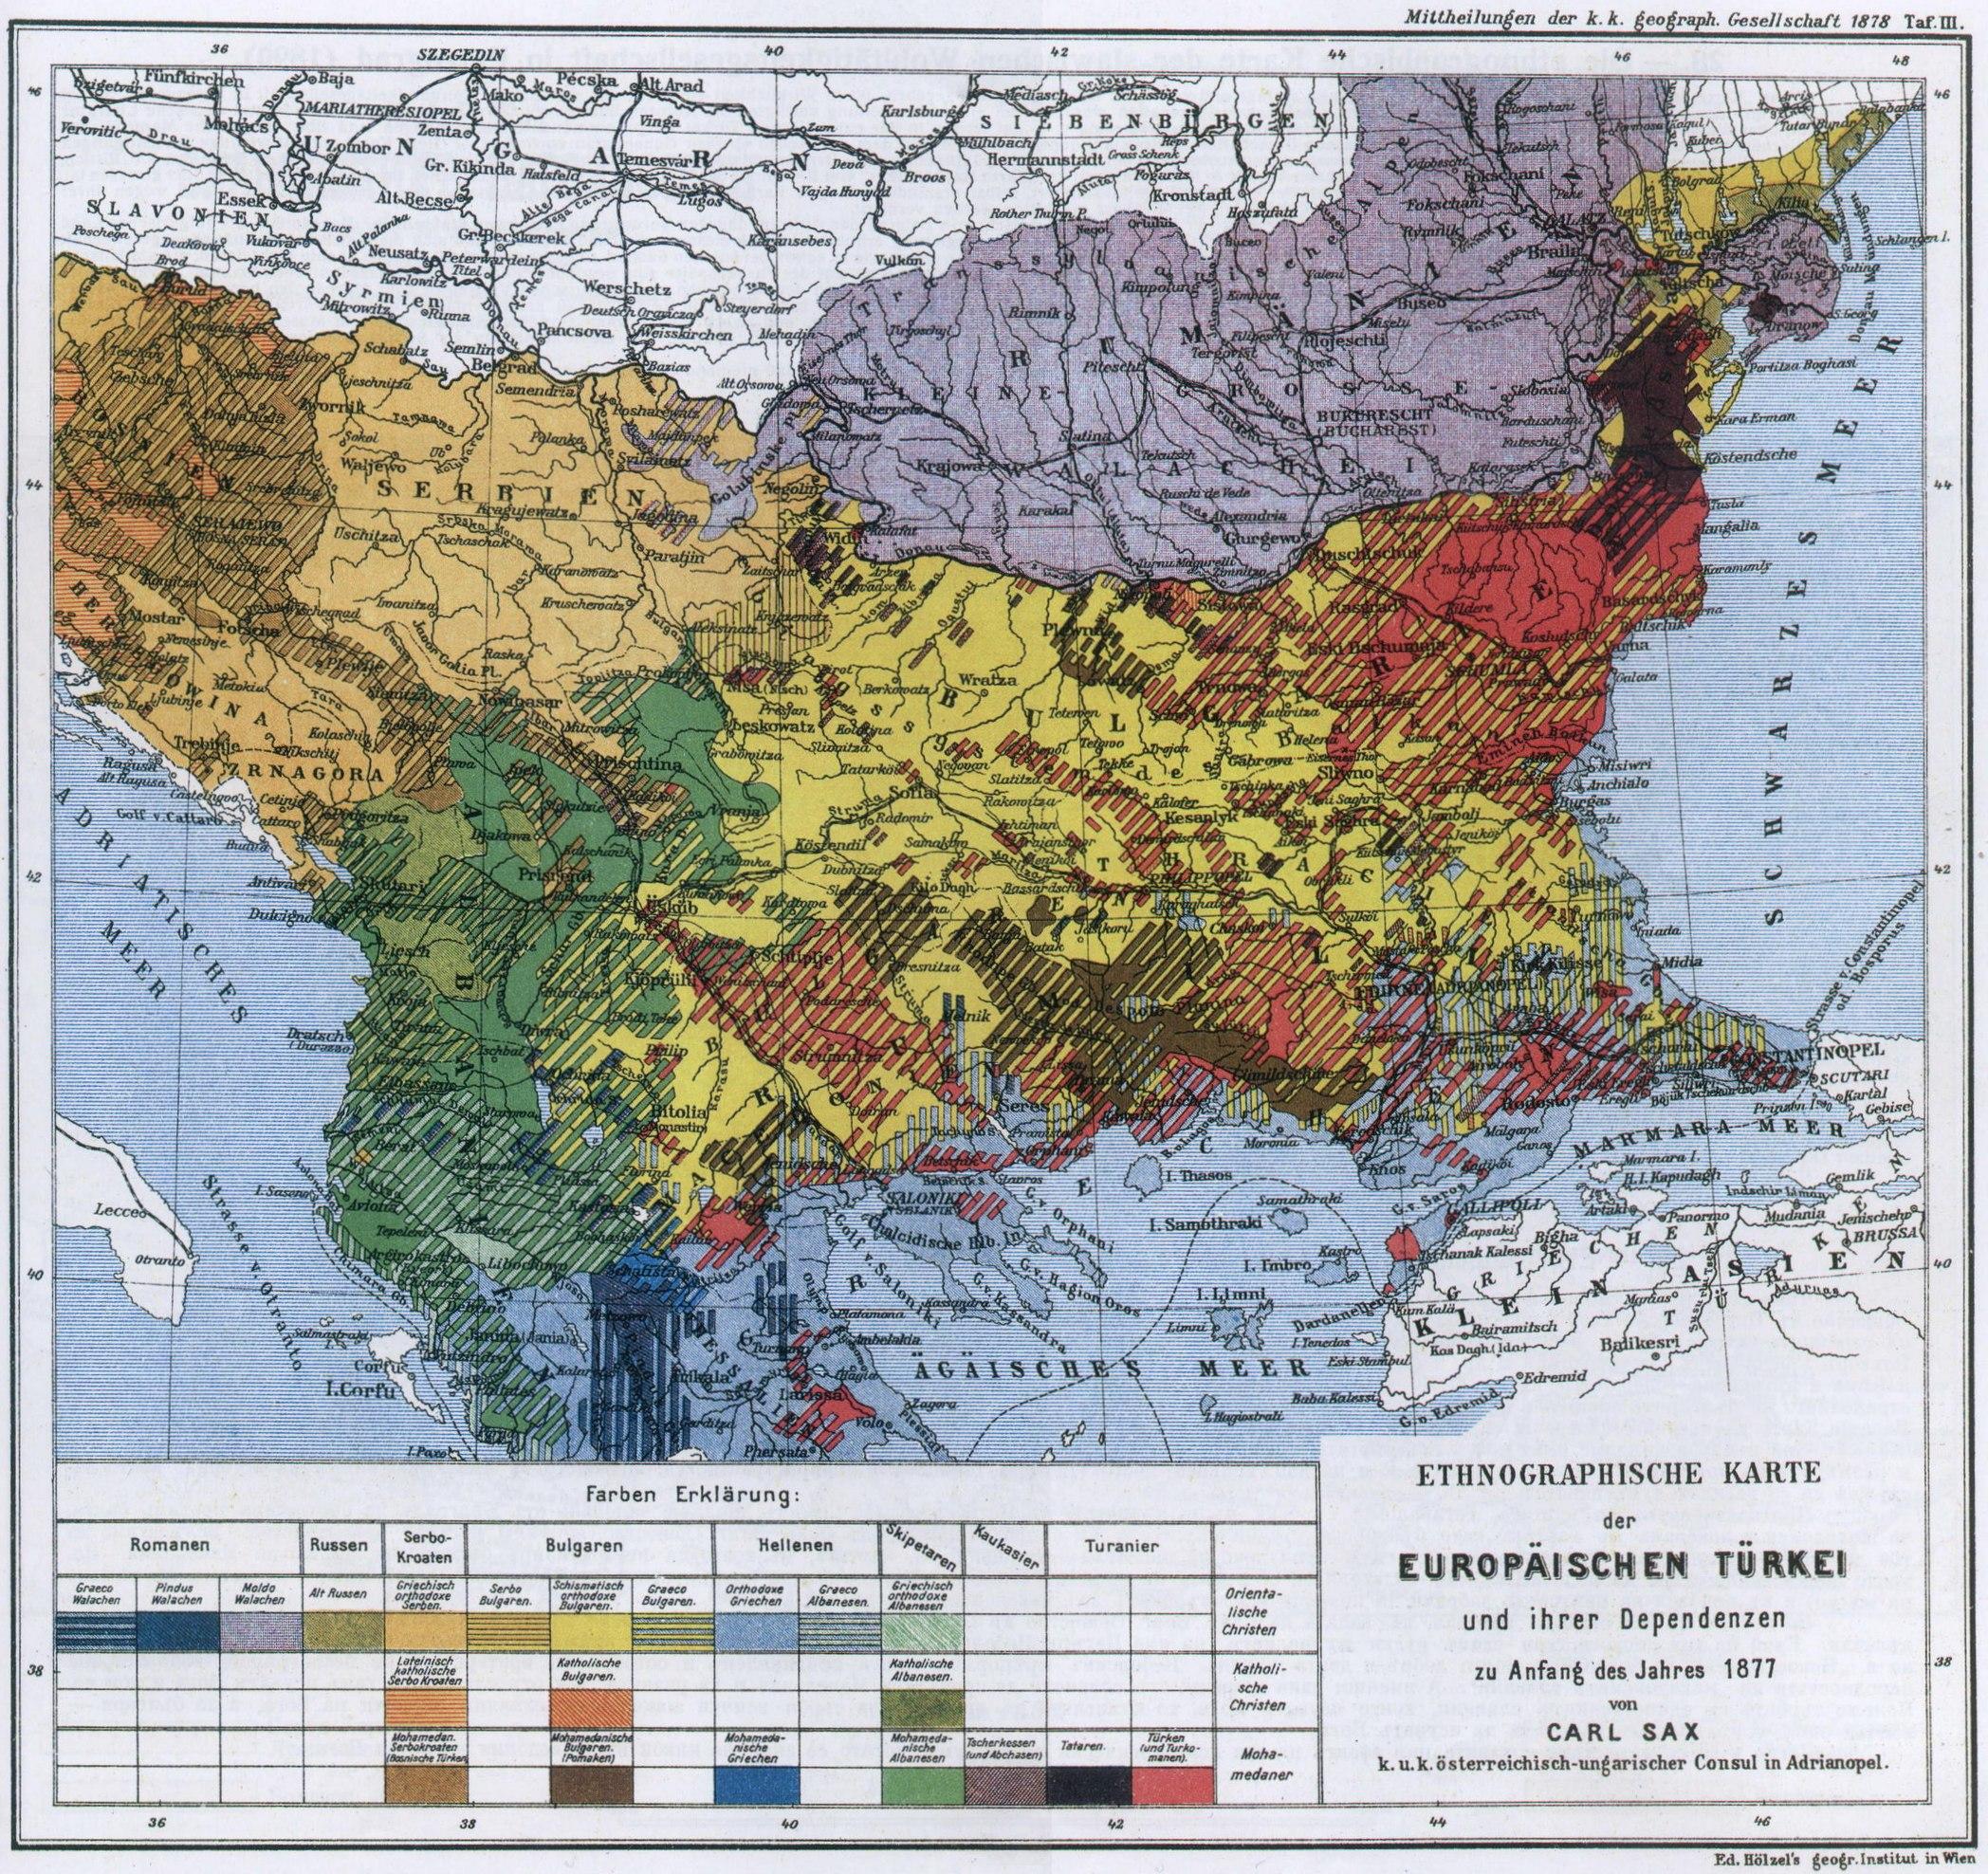 Ethnographic map of European Turkey 1877 Maps on the Web – Turkey on the Map of Europe